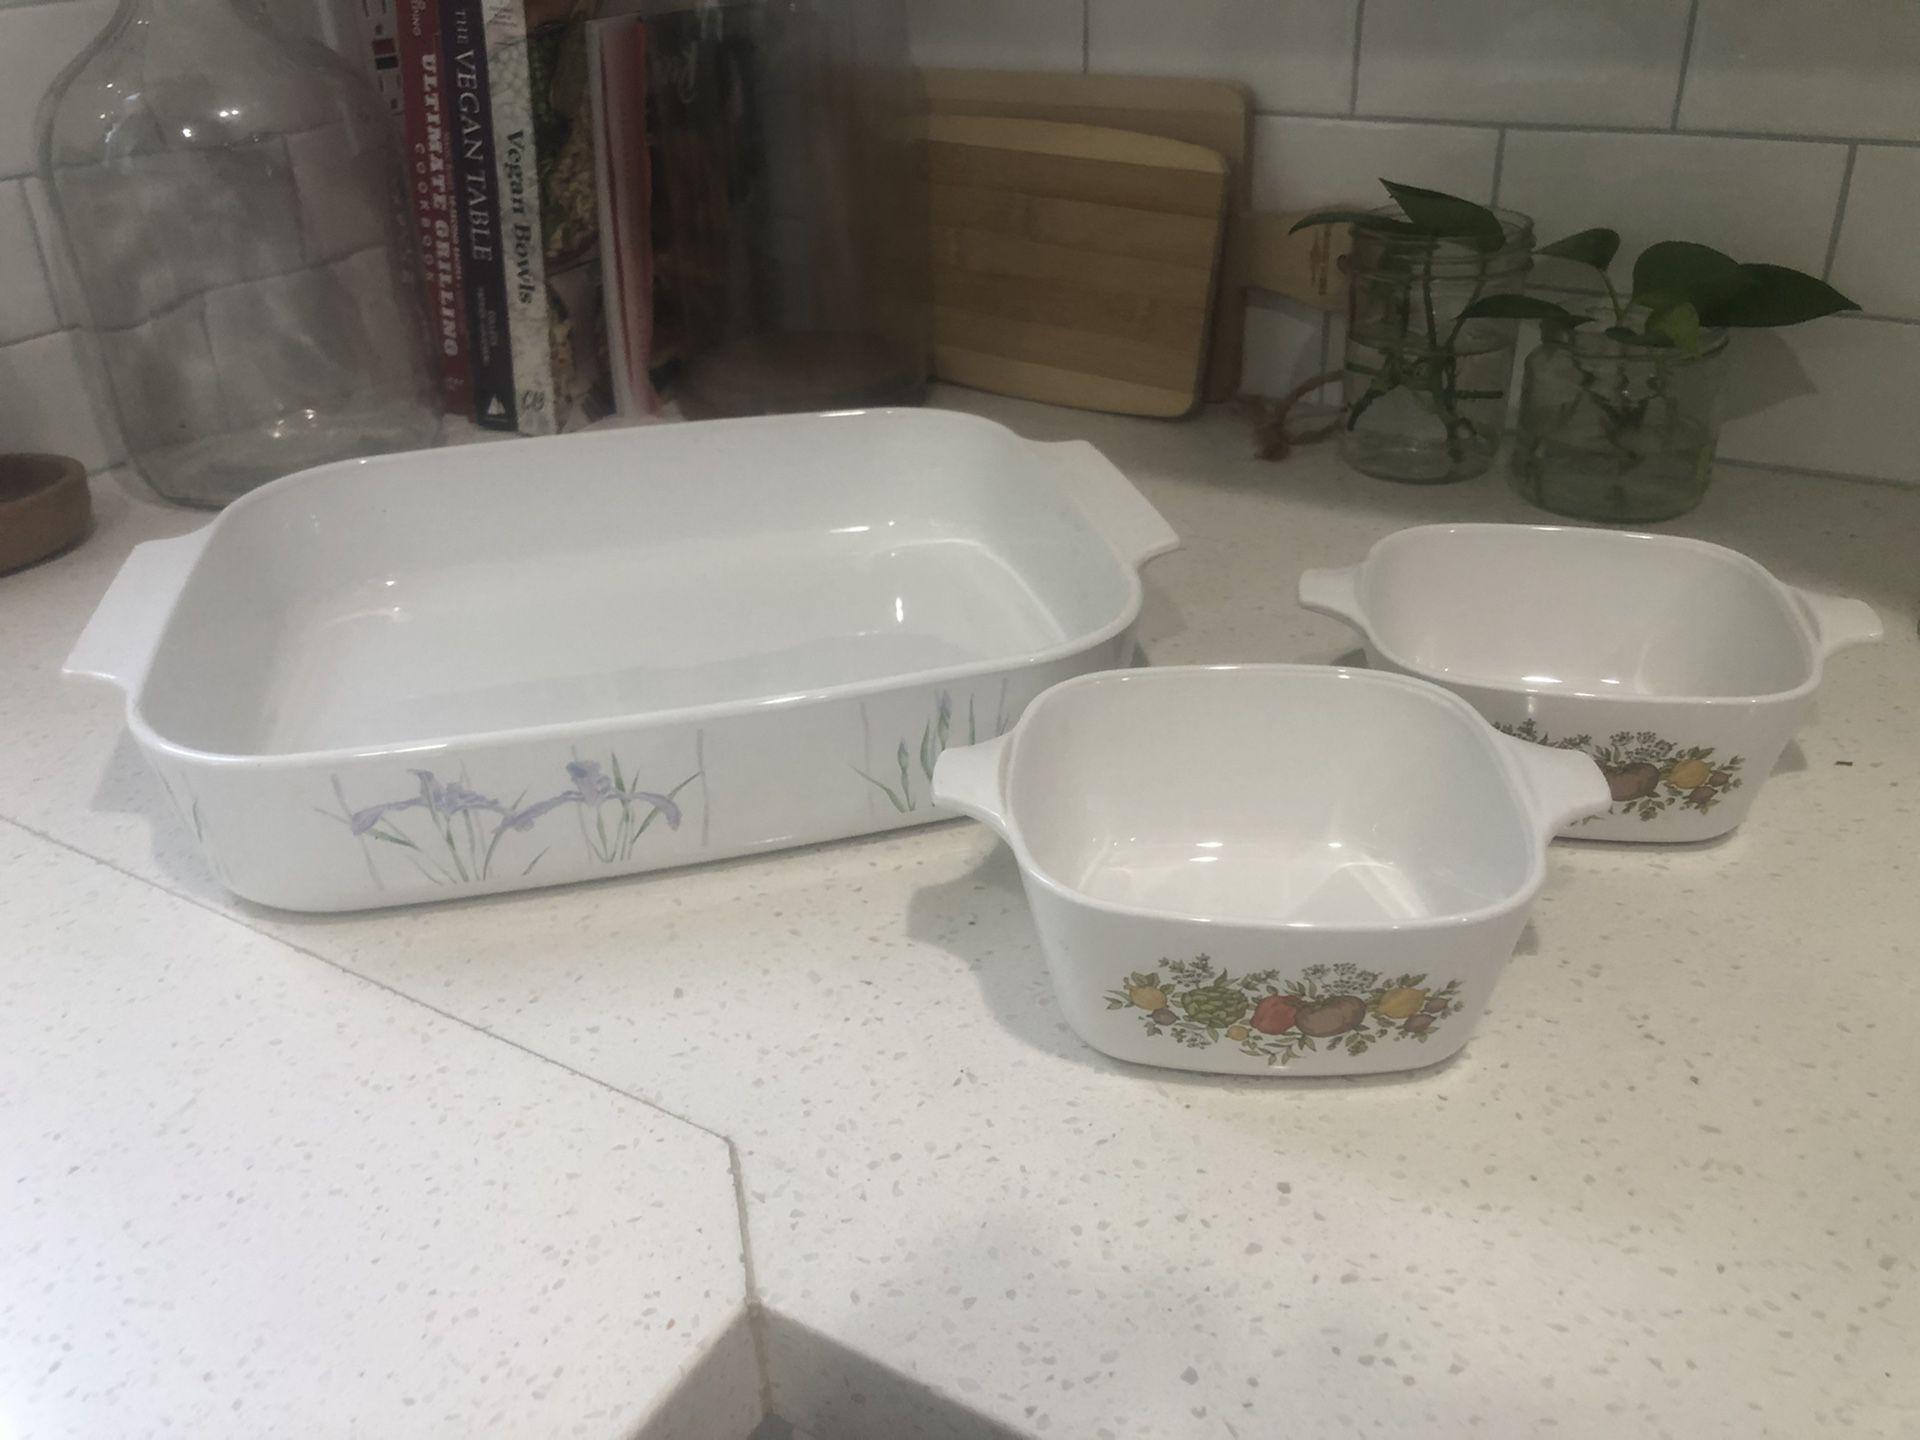 Vintage Corningware Cooking Dishes